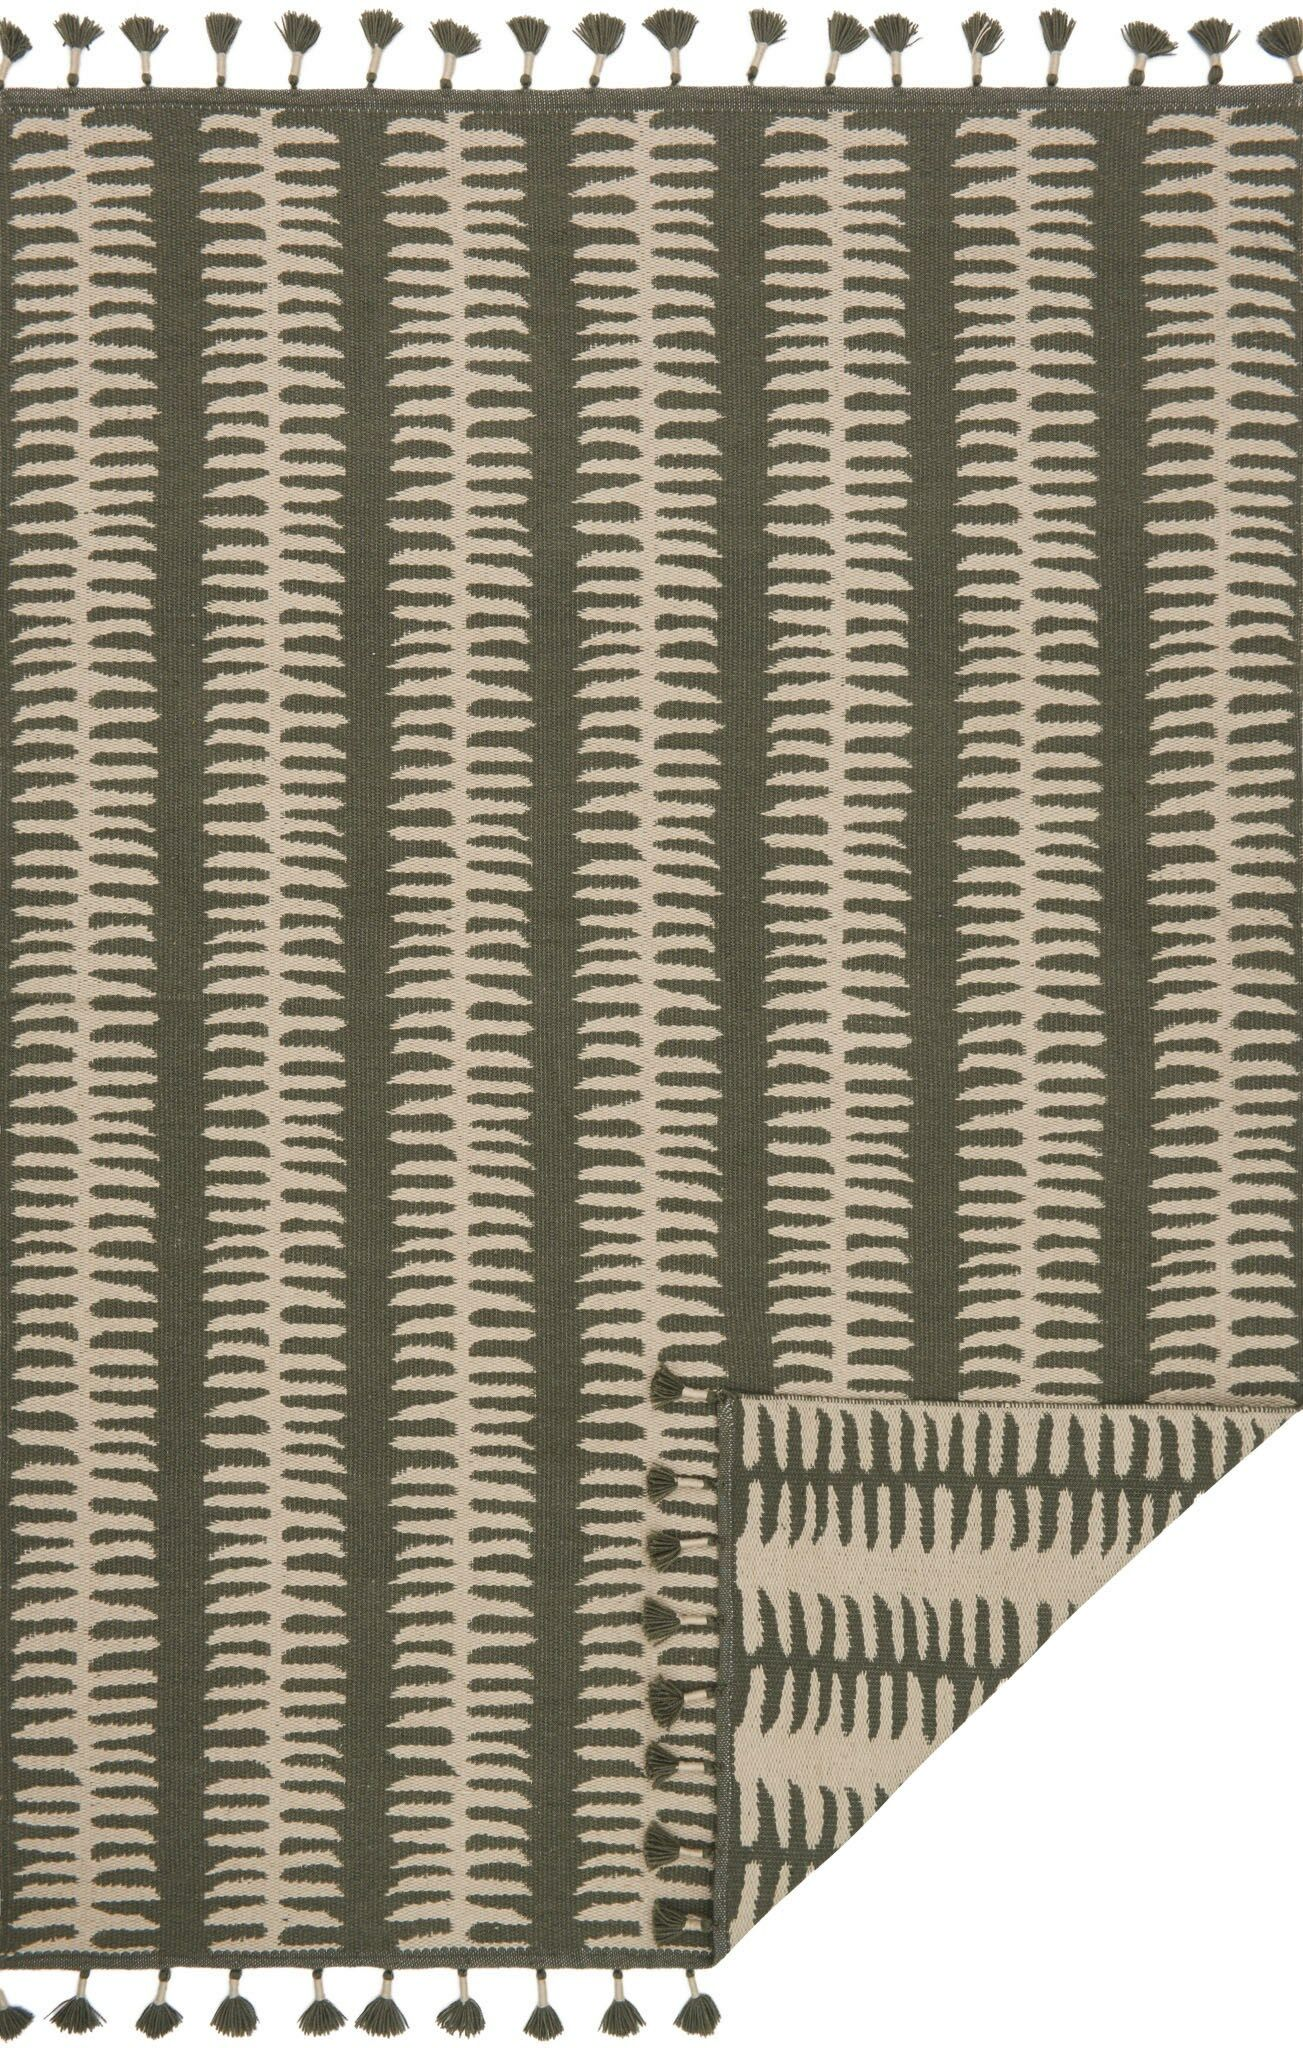 Pangburn Hand-Woven Gray/Silver Area Rug Rug Size: Rectangle 7'9